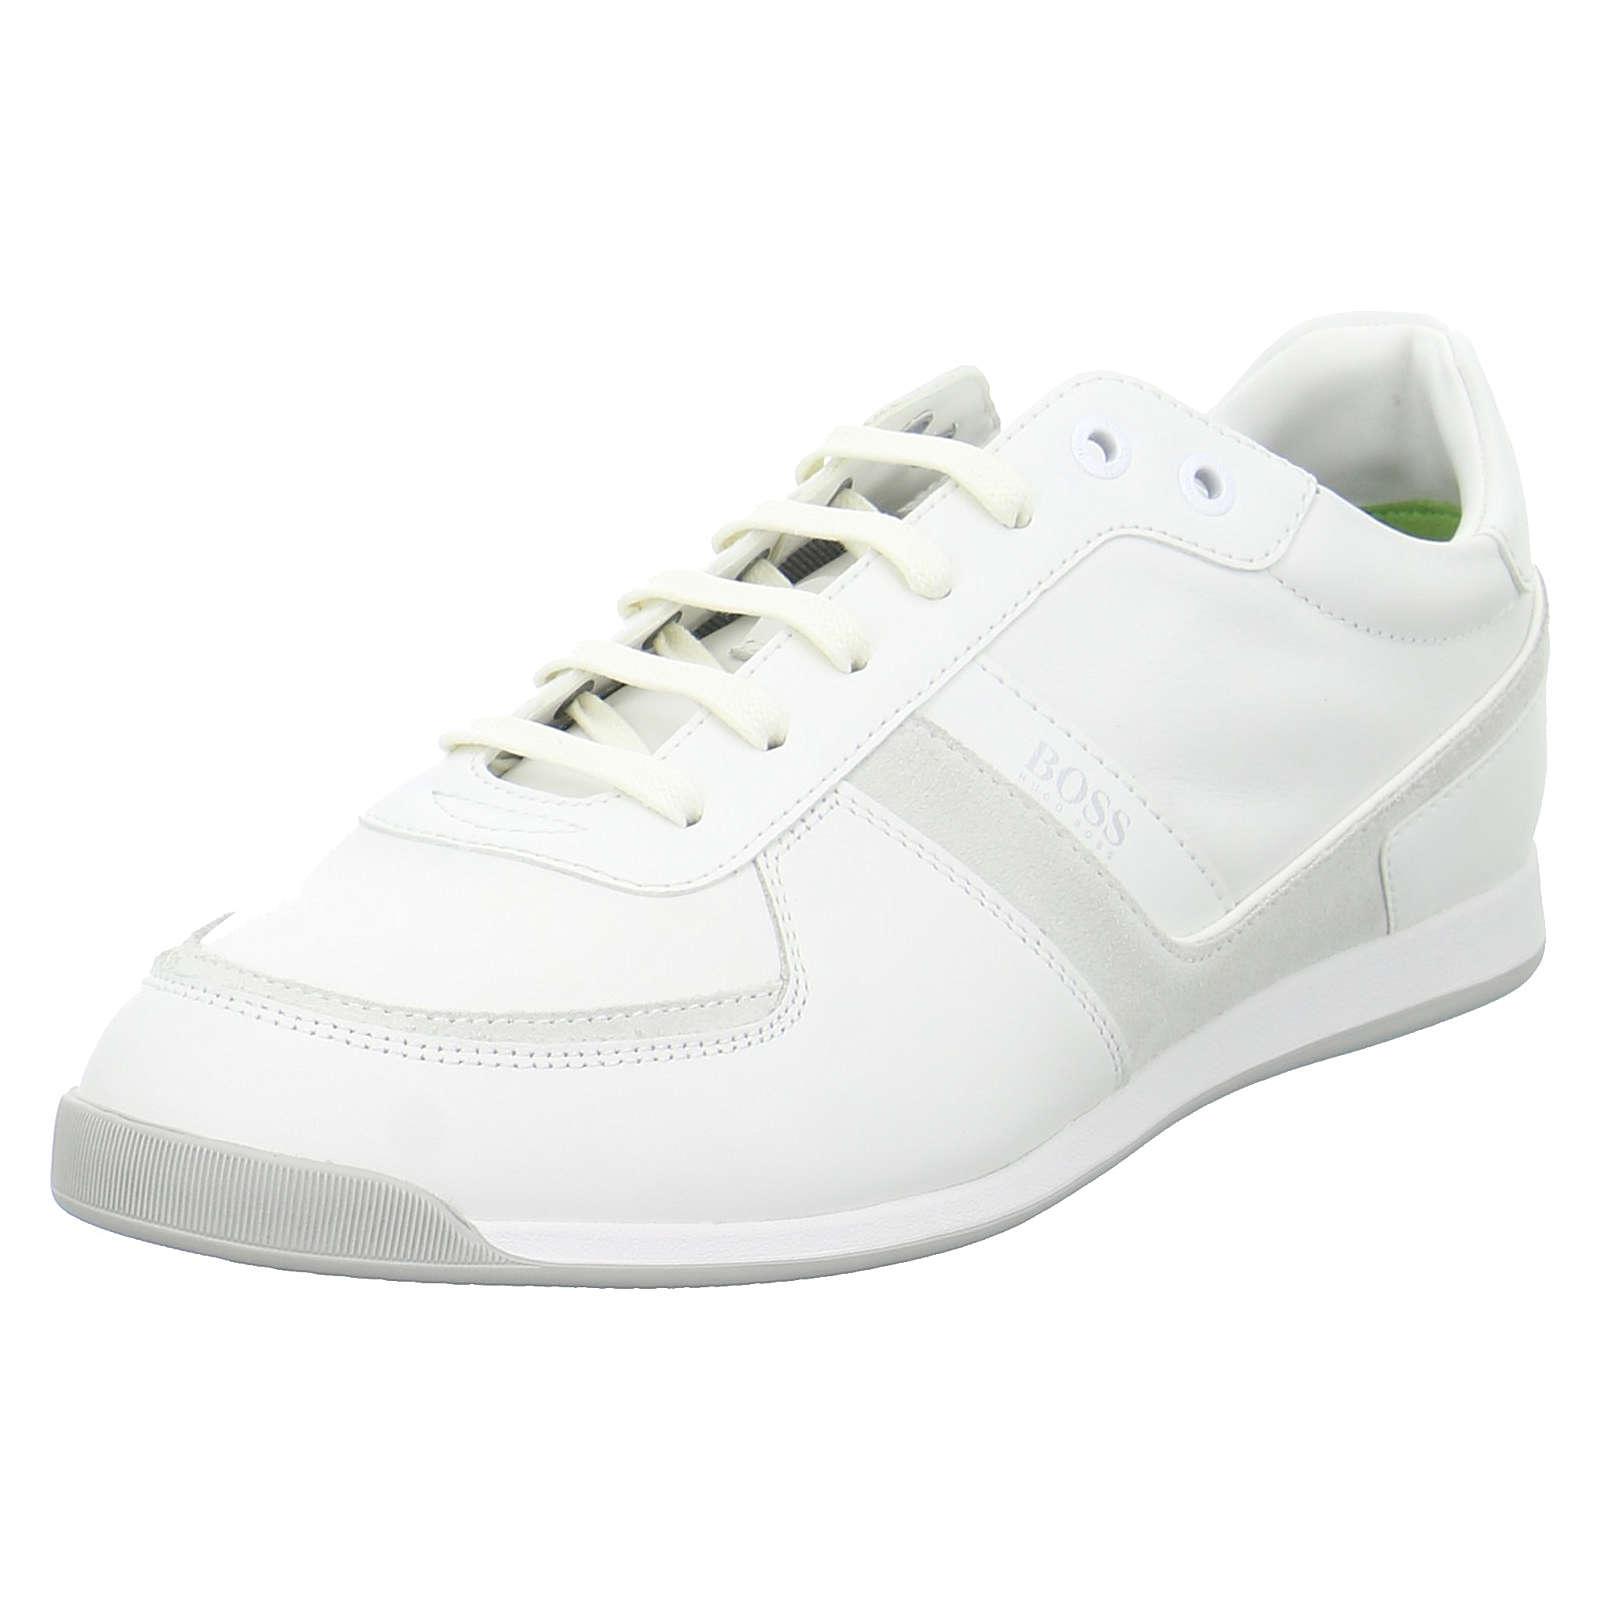 HUGO Sneaker Low MAZE_LOWP_LT Sneakers Low weiß Herren Gr. 43